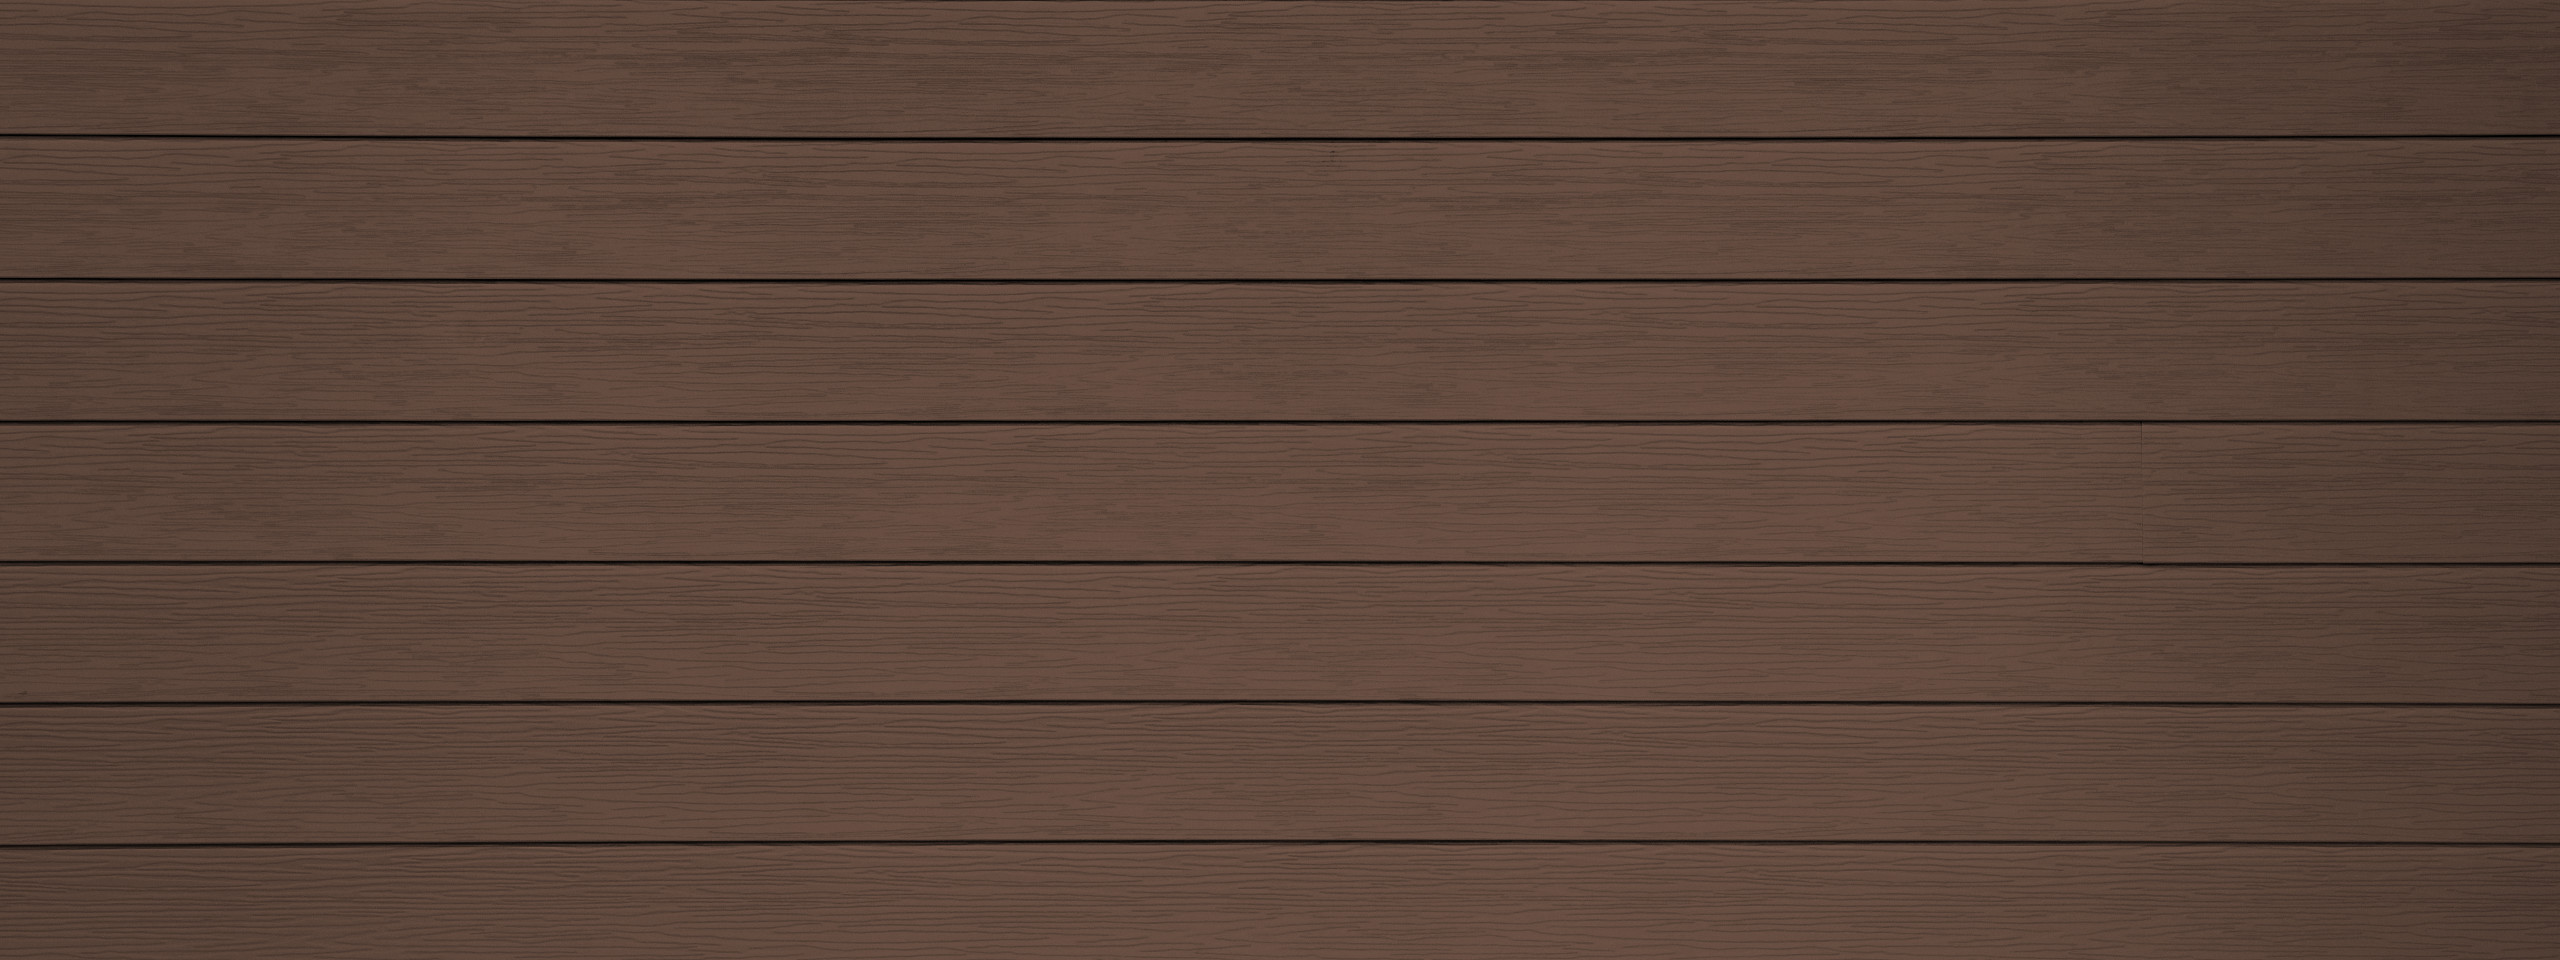 Entex traditional lap mahogany horizontal steel siding